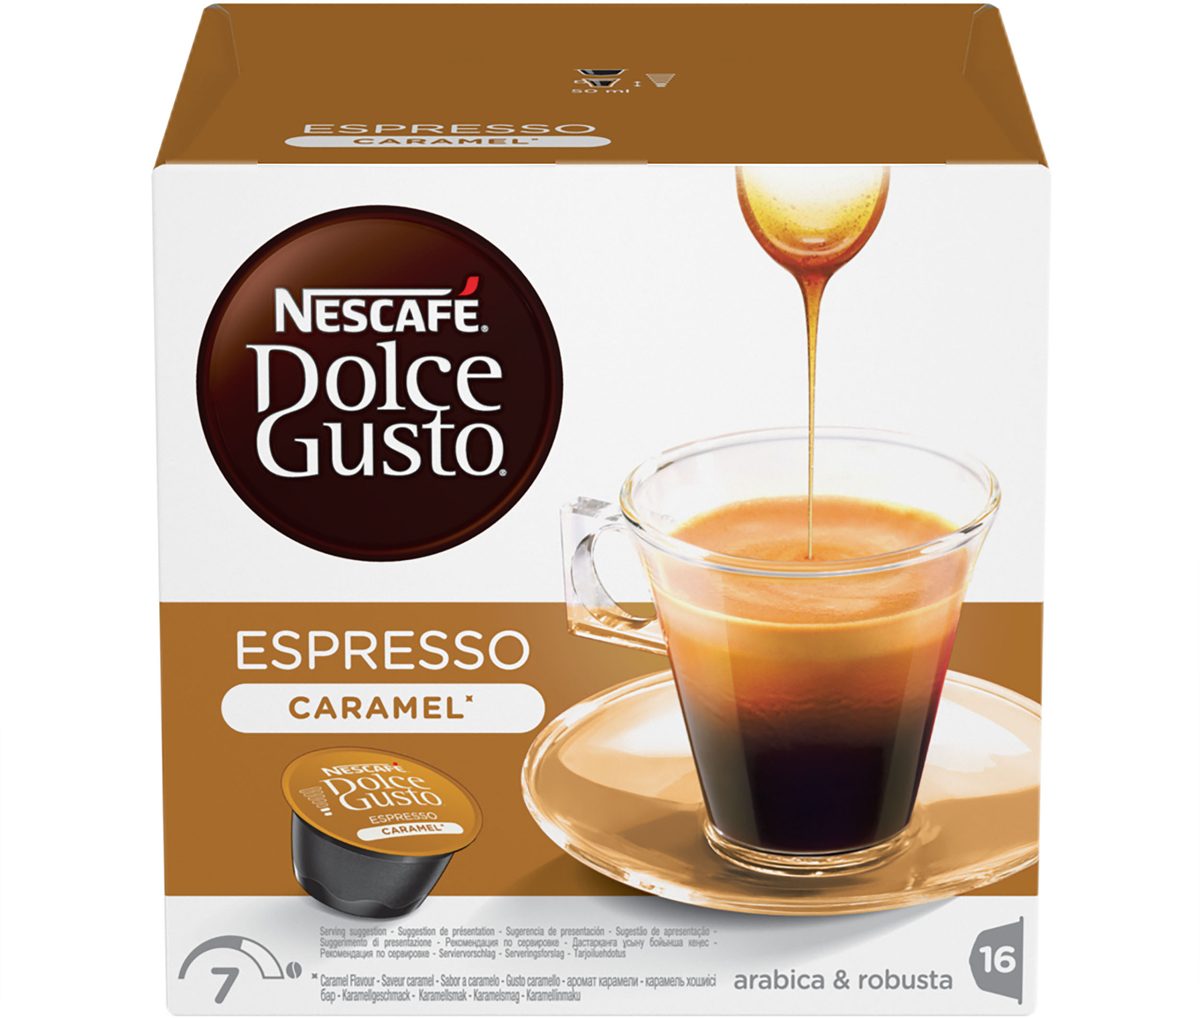 Nescafe Dolce Gusto Espresso Caramel кофе в капсулах, 16 шт кофе sokolov кофе в капсулах sokolov эспрессо лунго 10 шт